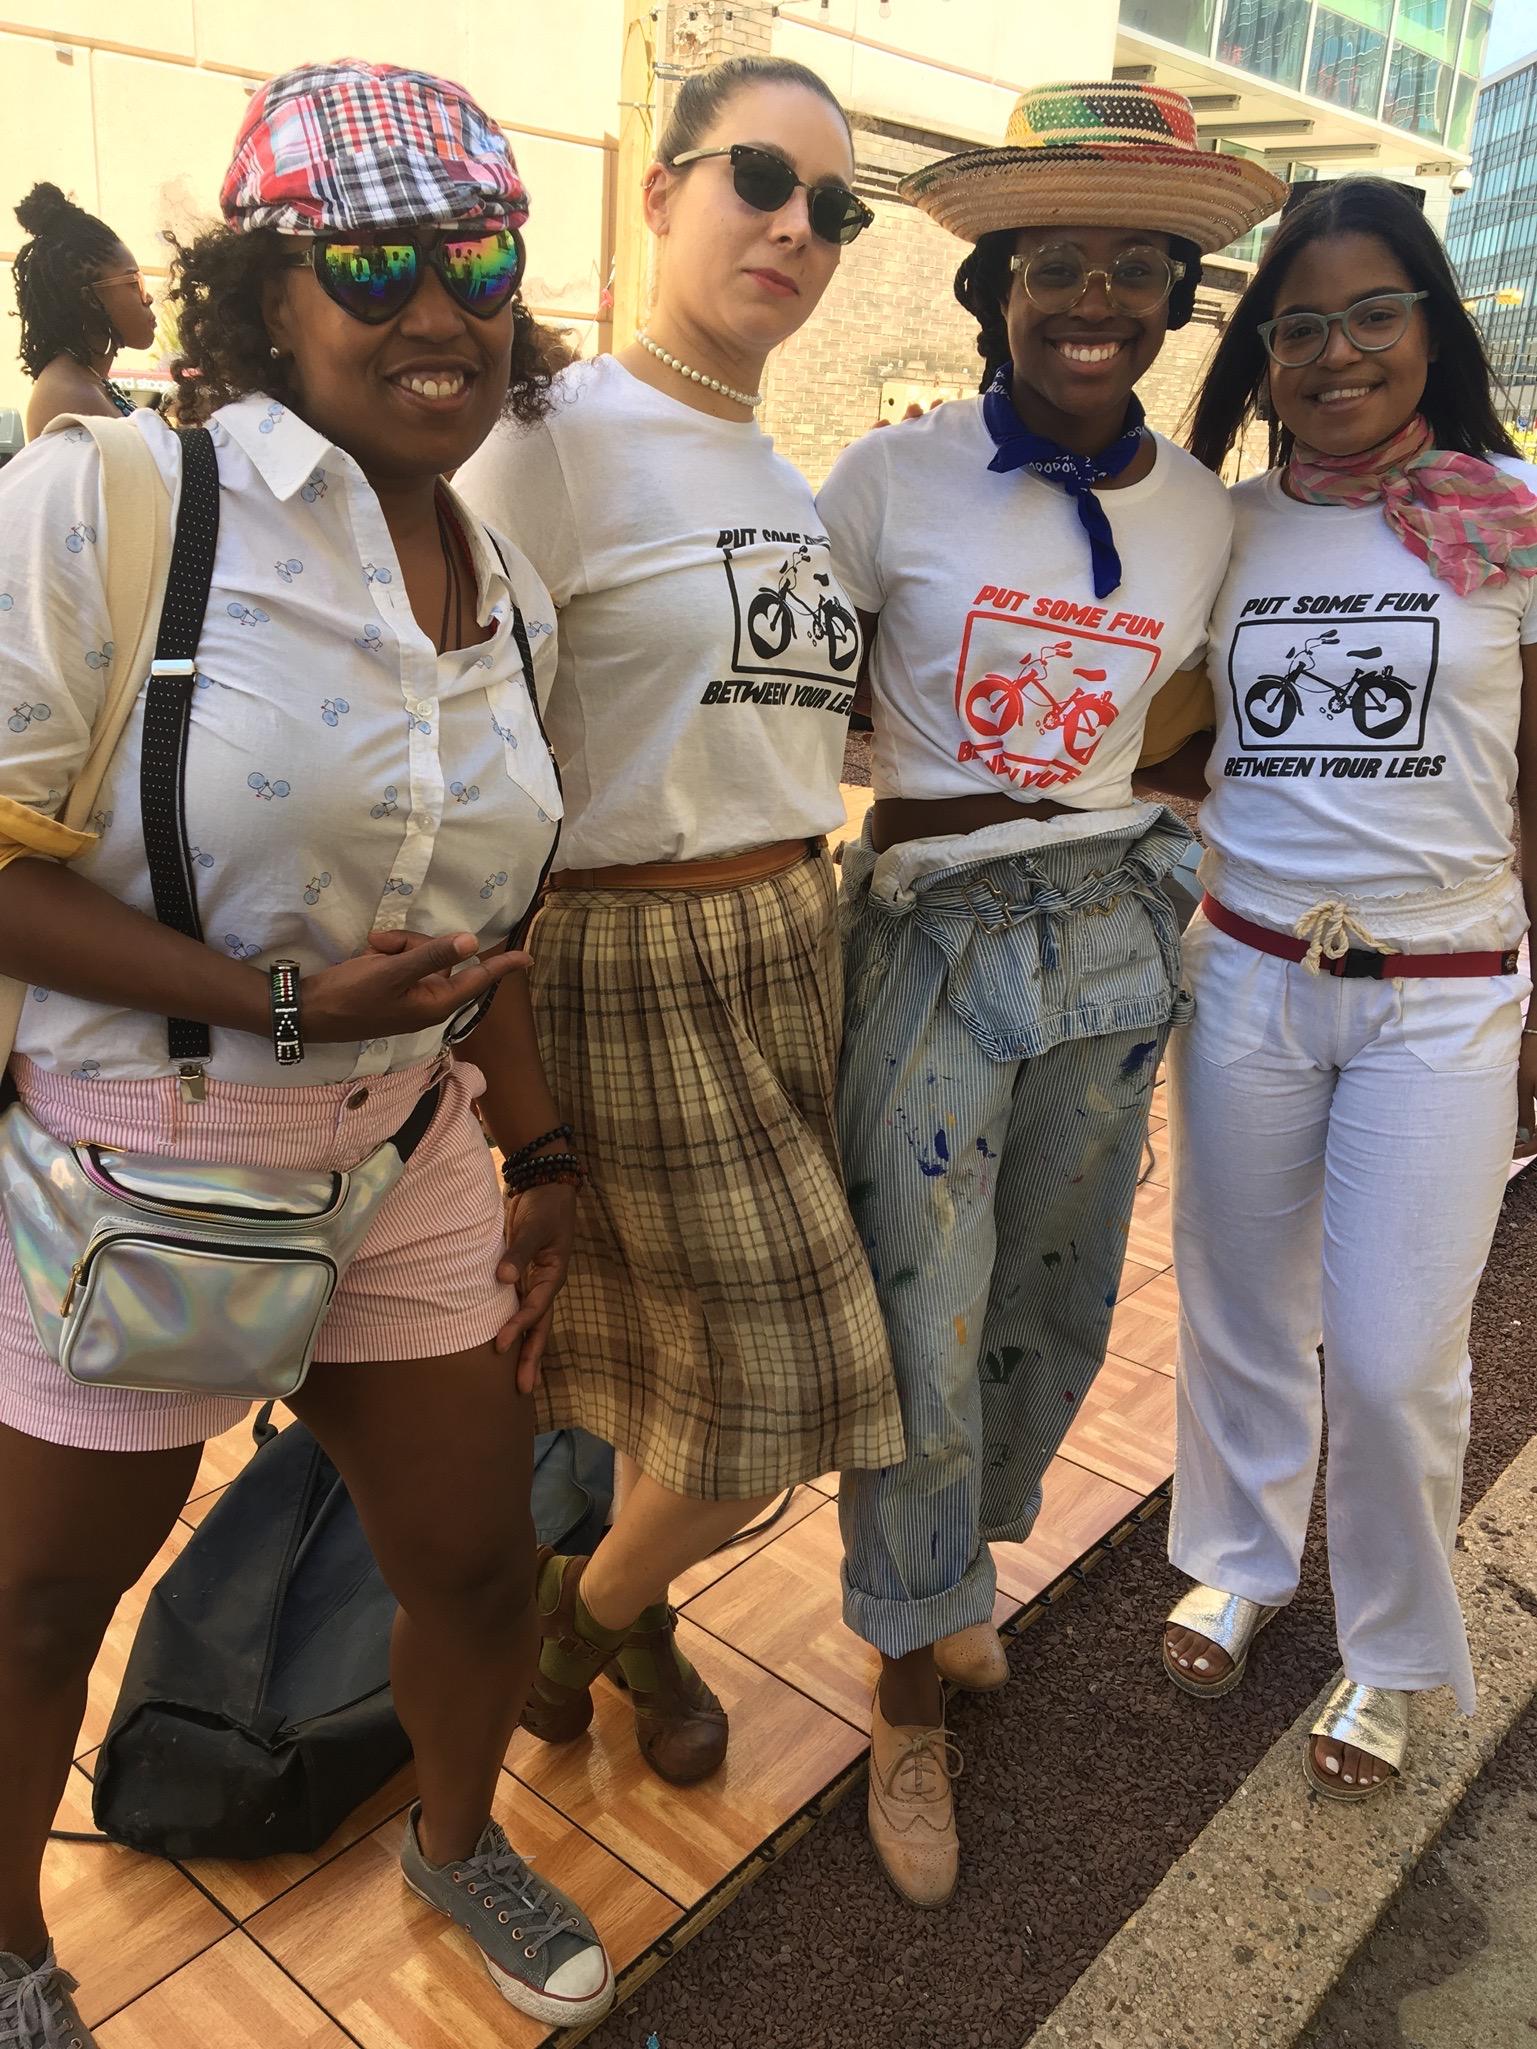 Bike Marshals Stacee Robertson with Girls On Bikes (Samantha Katehis, Kala LaFortune Reed, Nelsy Baro)